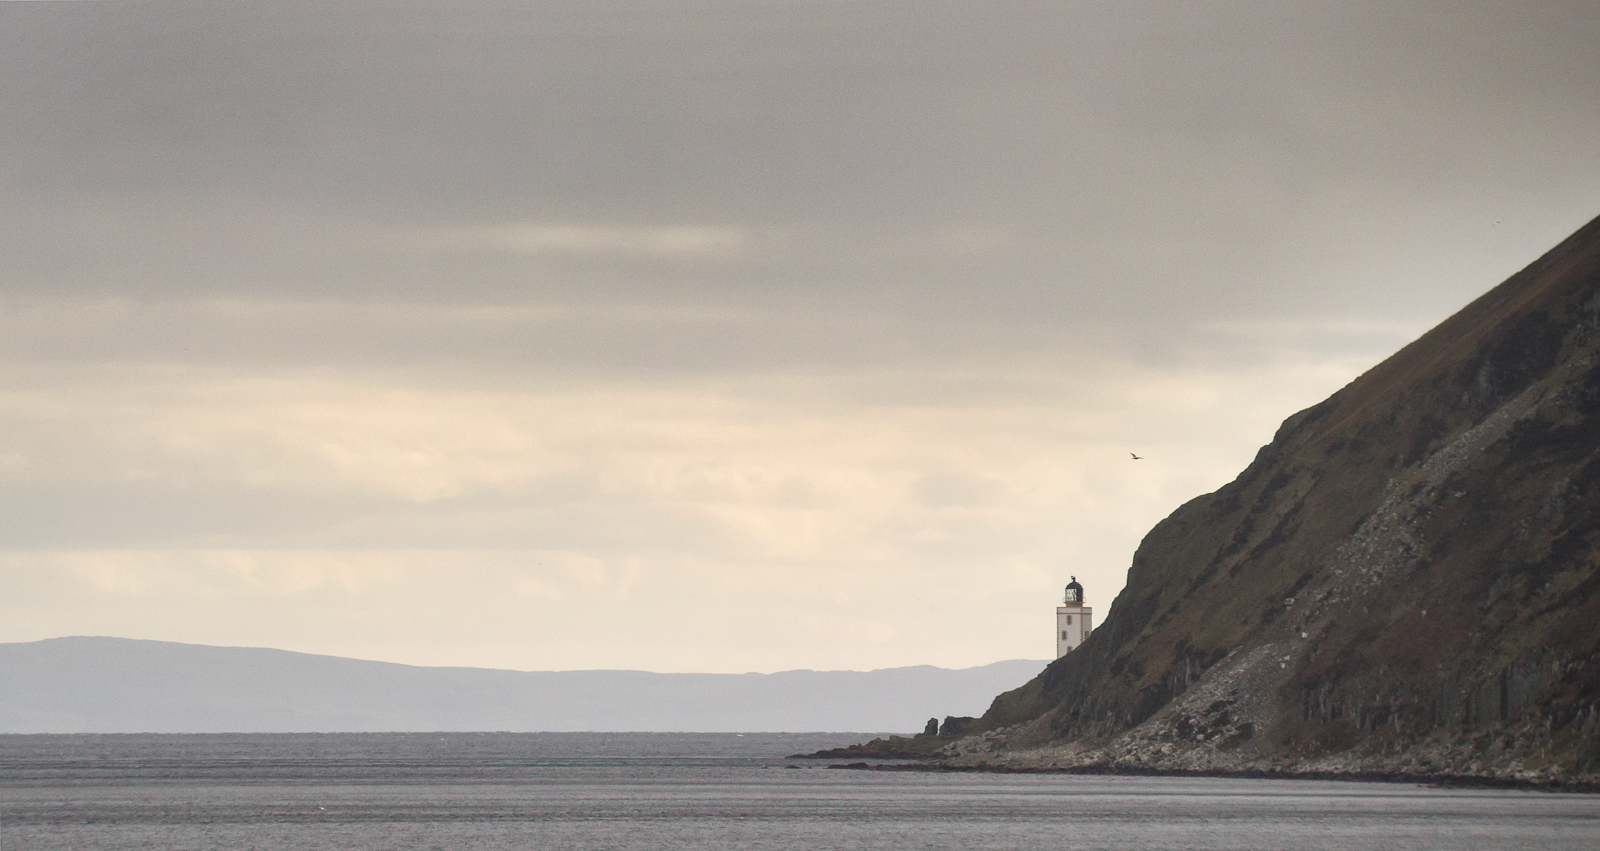 Holy Island lighthouse